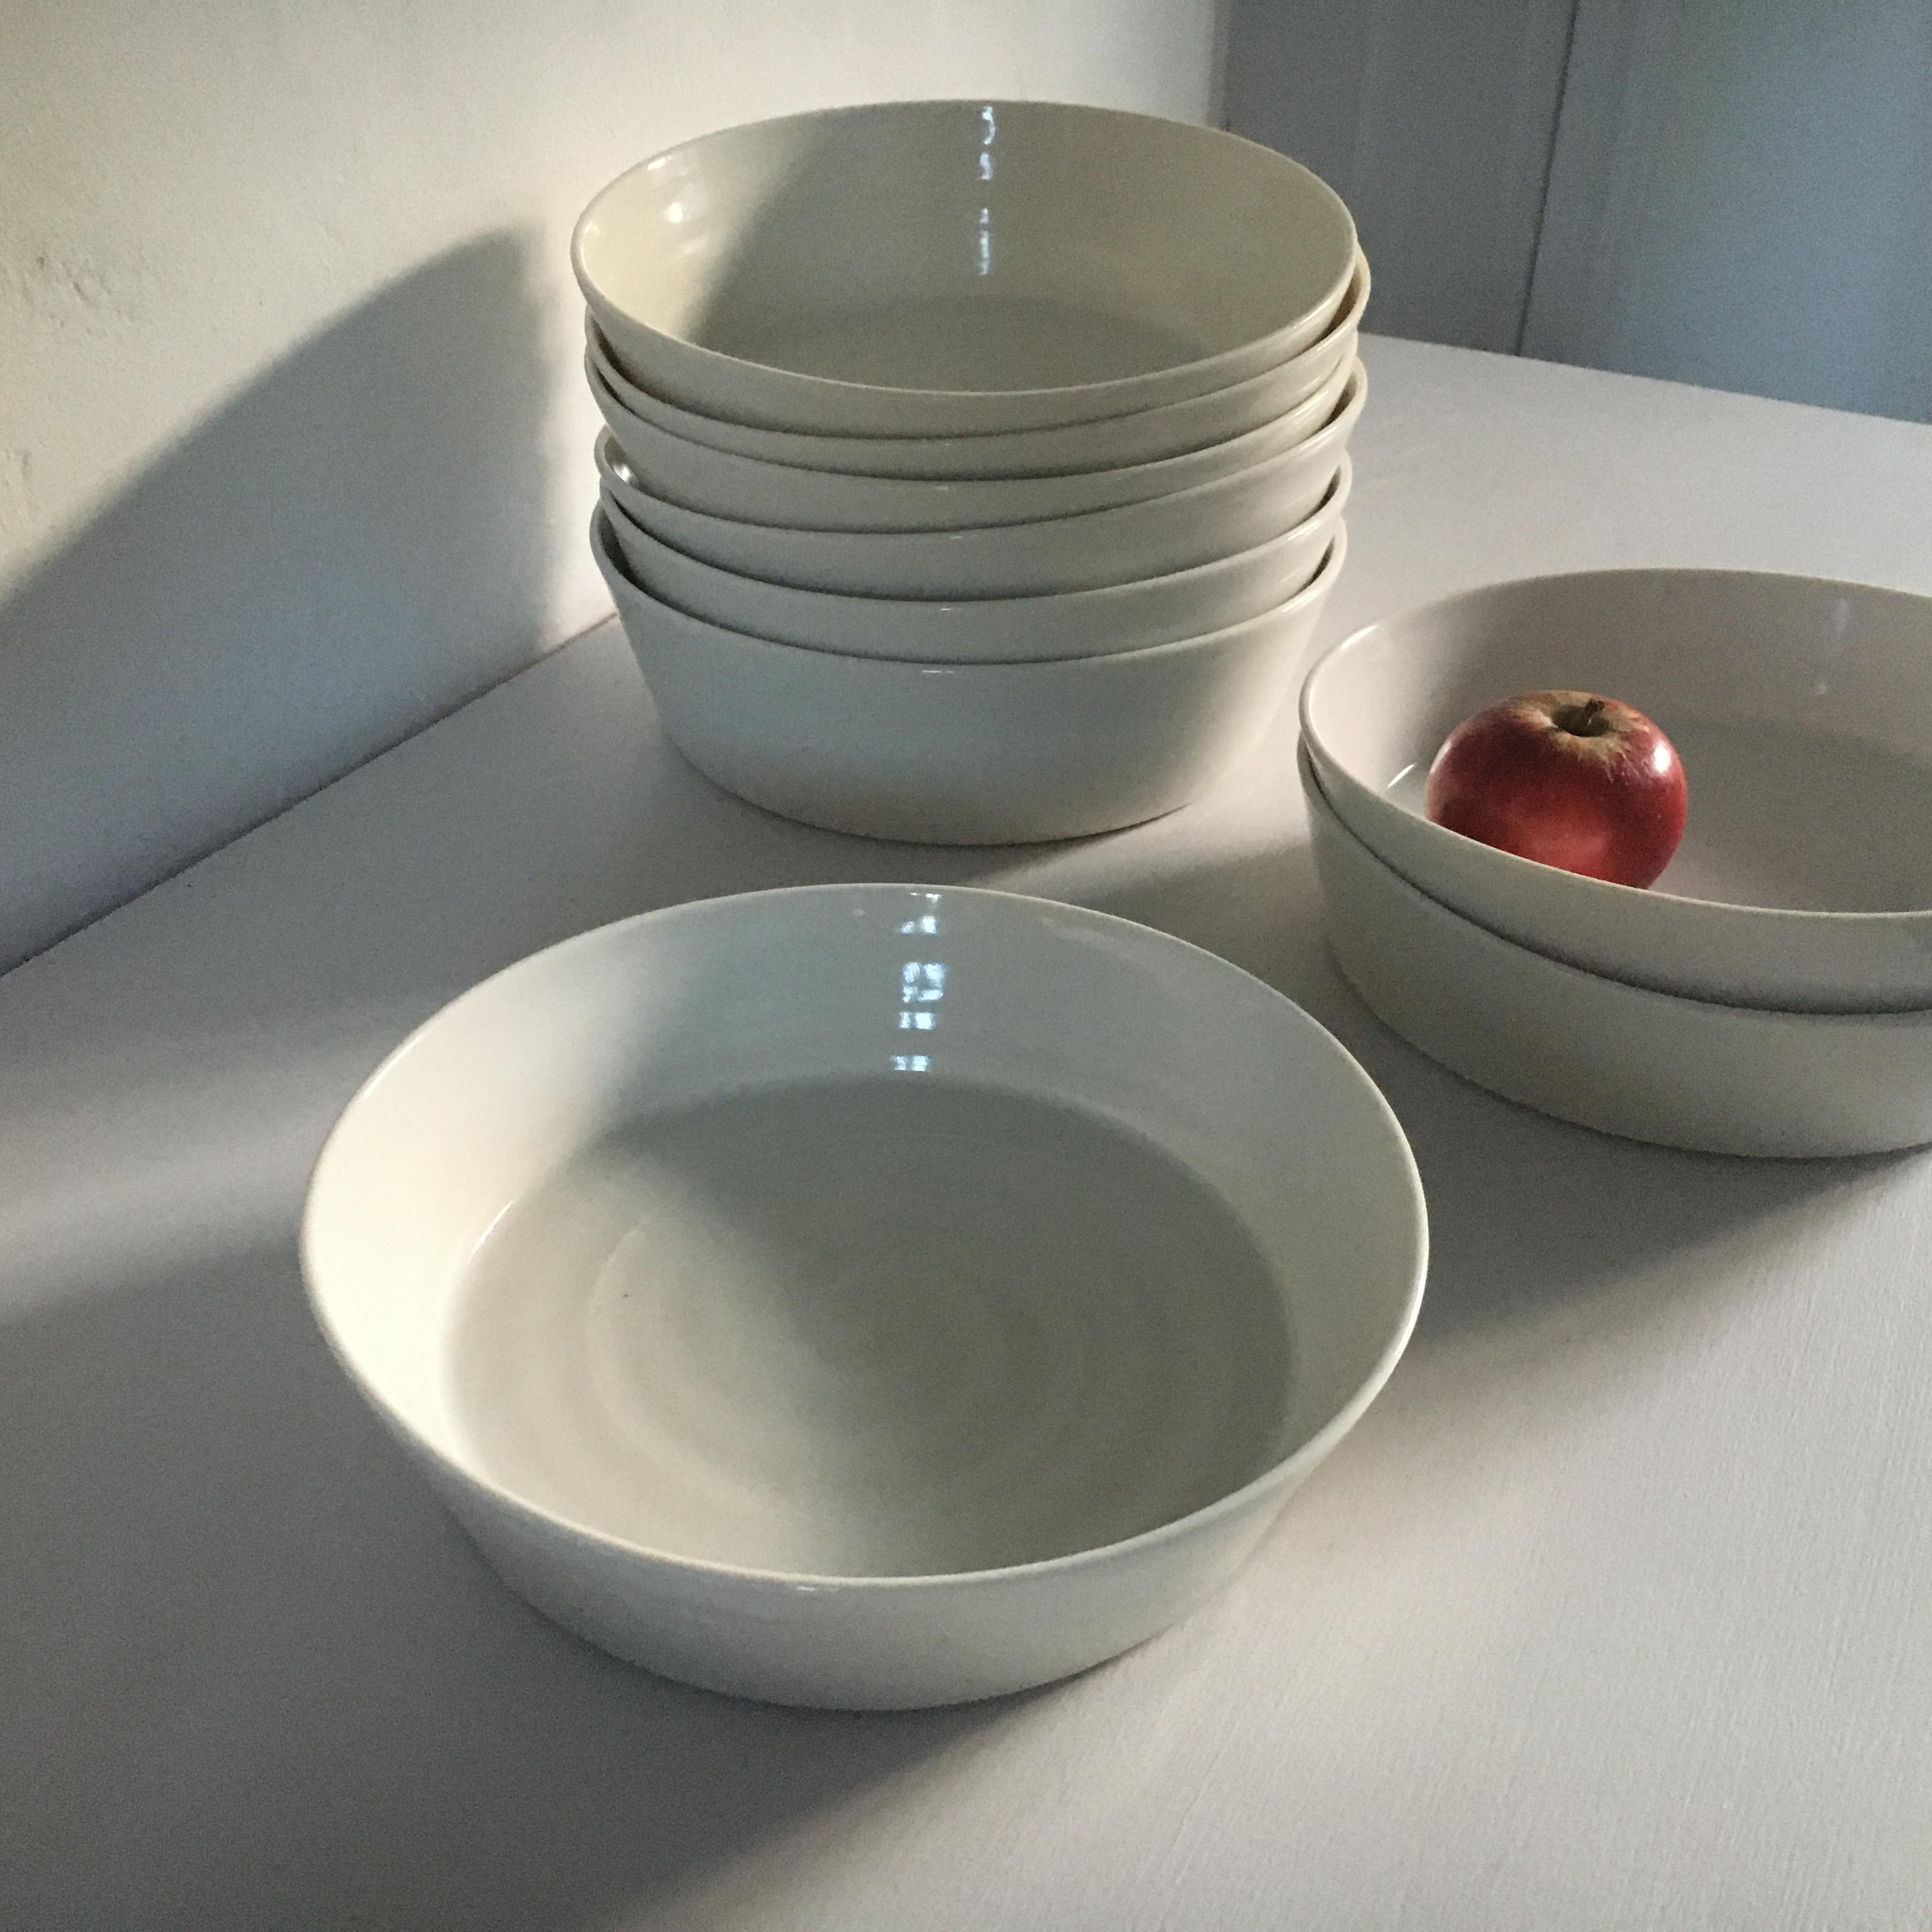 Shaker bowls